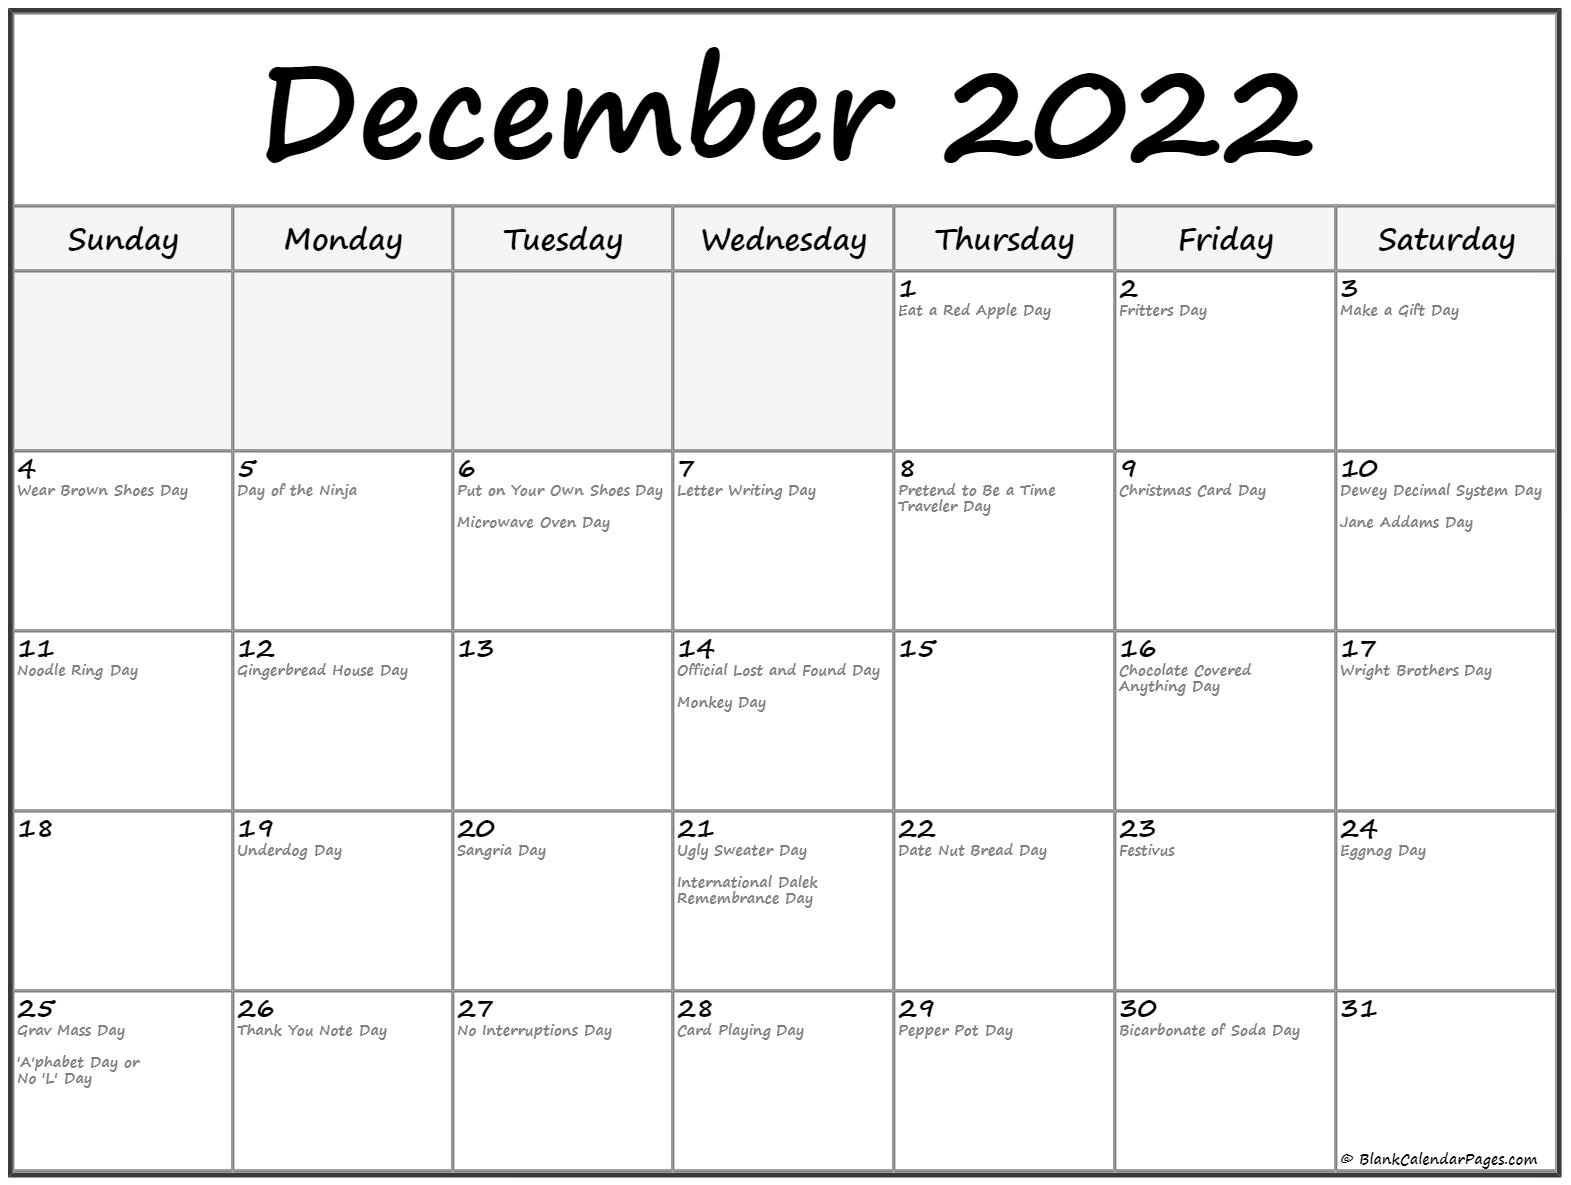 December 2020 funny holidays calendar